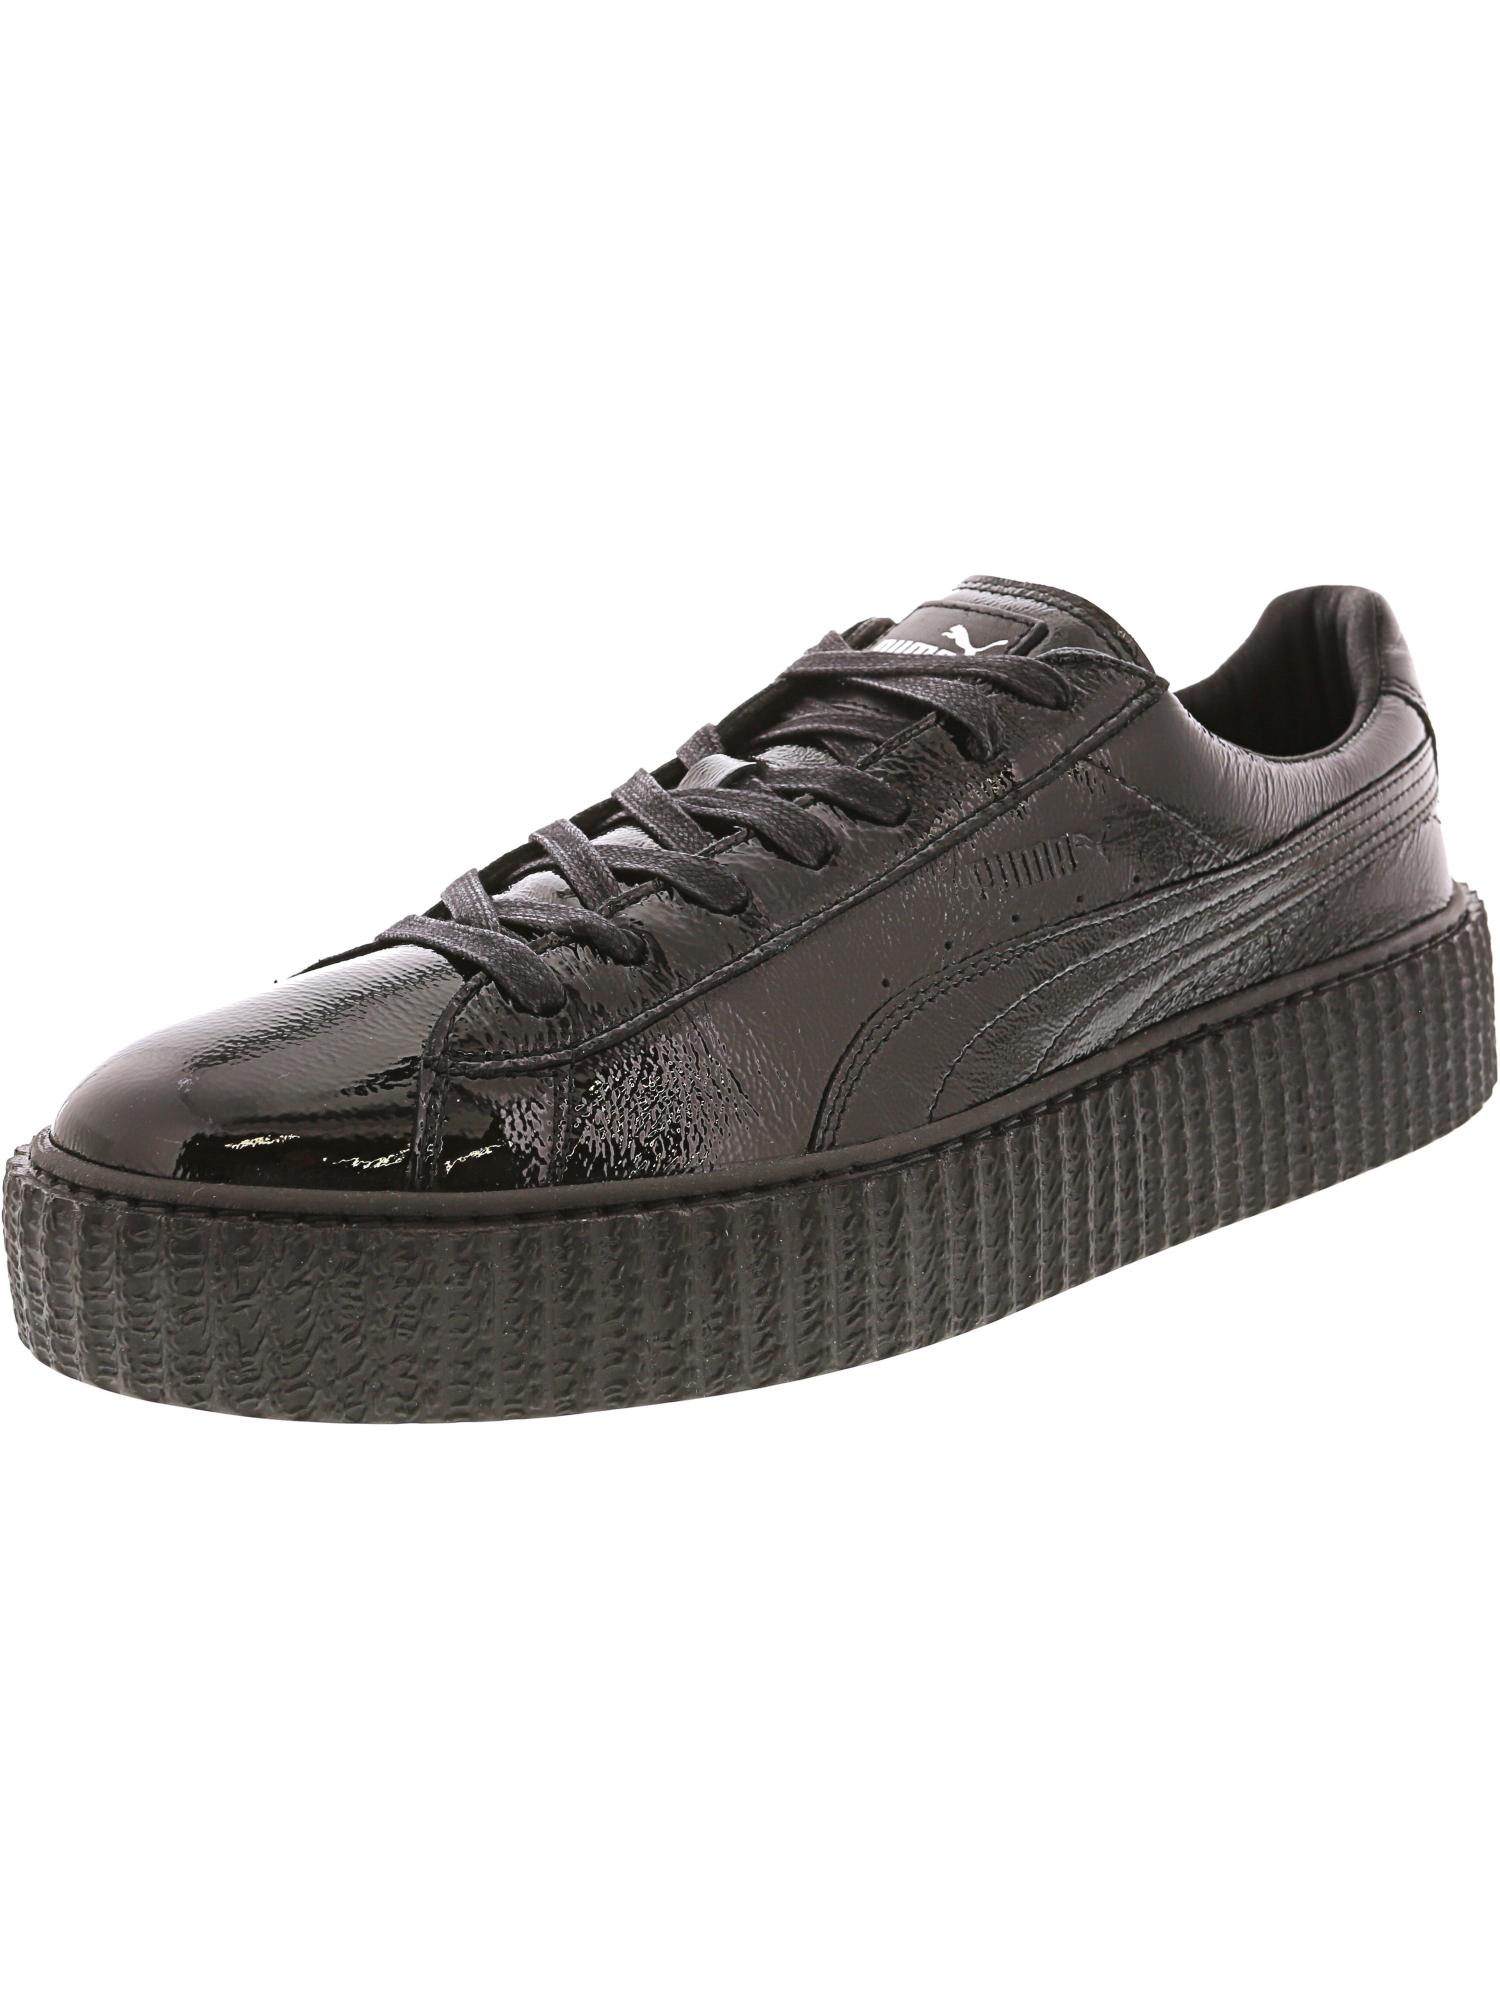 b4f5c8de5ee241 Creeper Ebay Fenty 11 Puma Leather Black Rihanna Shoes Men s Cracked 4g4zYqx